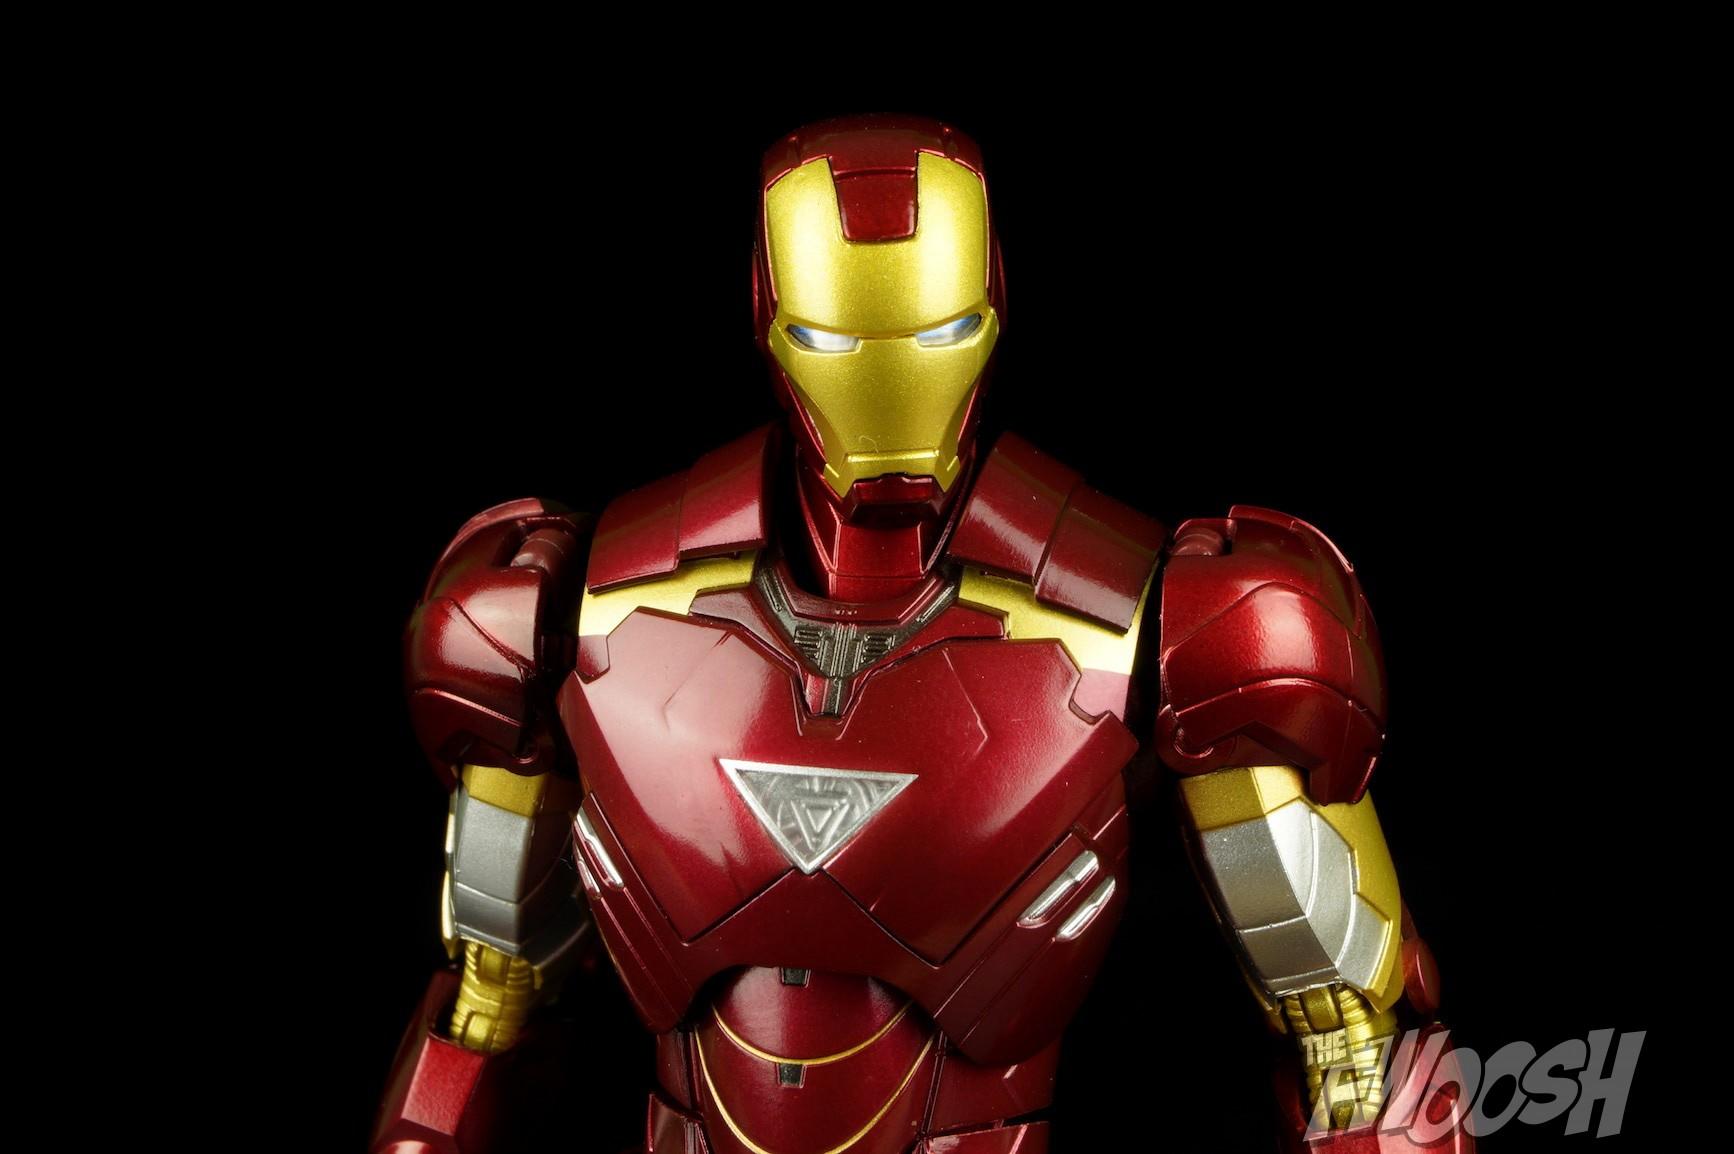 bandai sh figuarts iron man 2 mark vi hall of armor